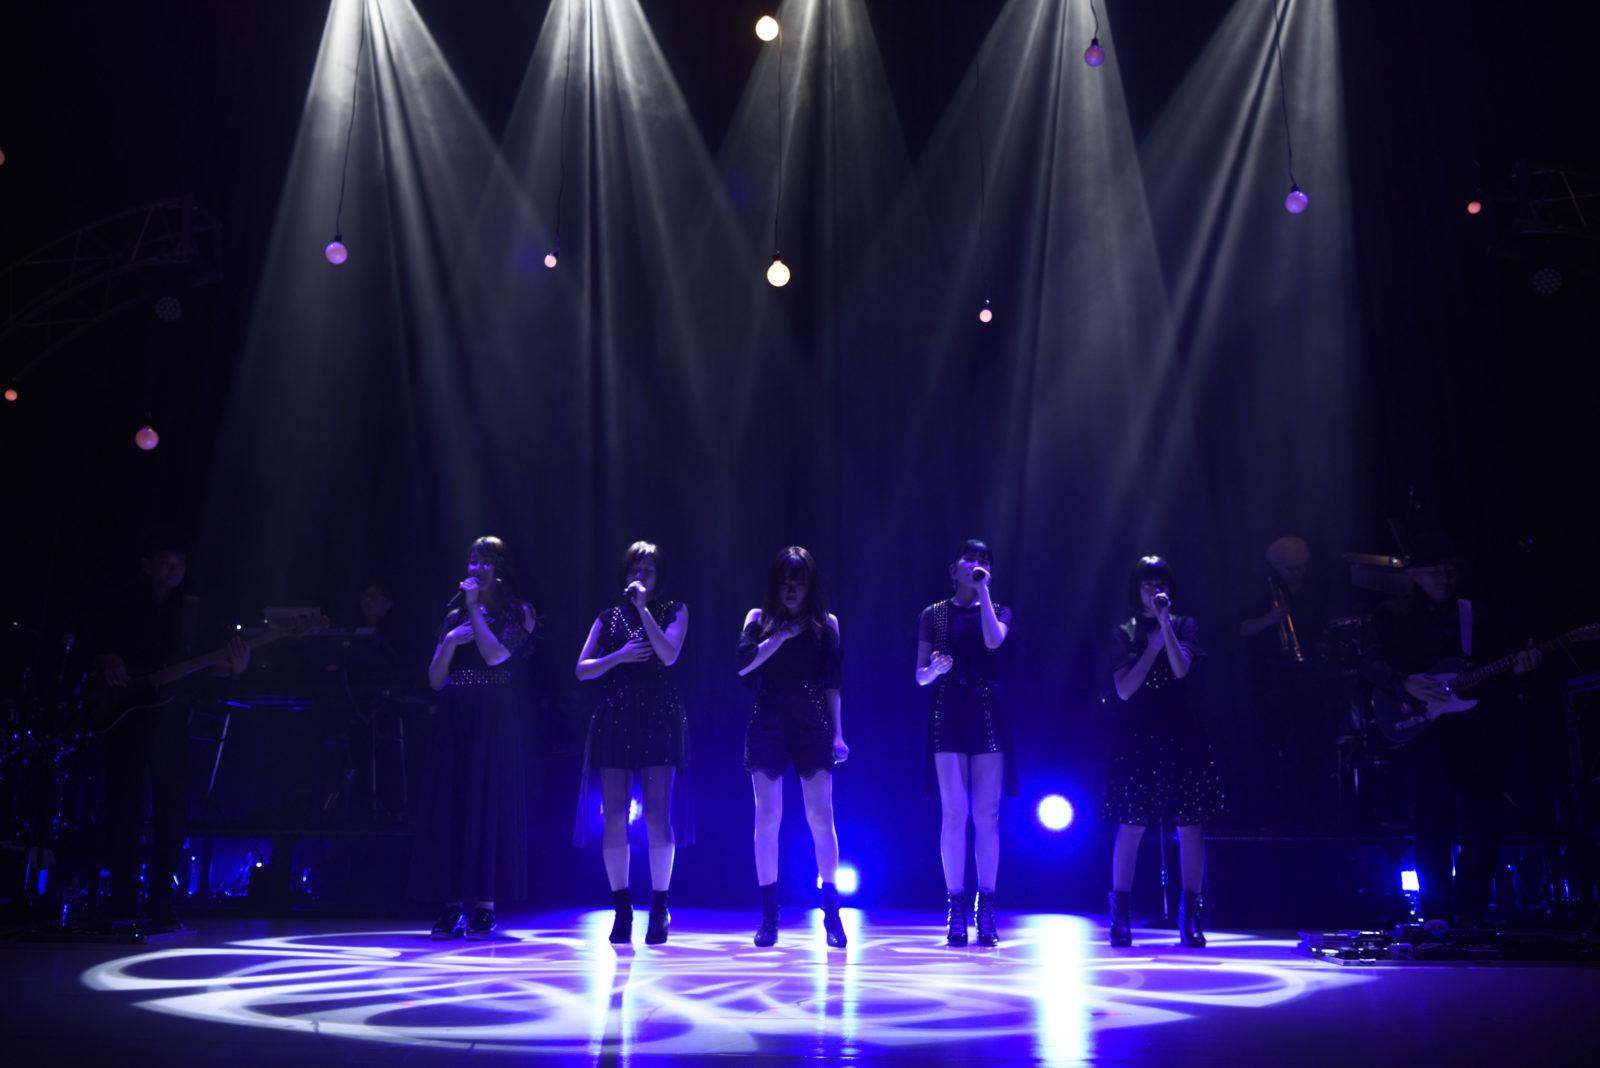 Little Glee Monster、2月に行う武道館公演をWOWOWで放送決定サムネイル画像